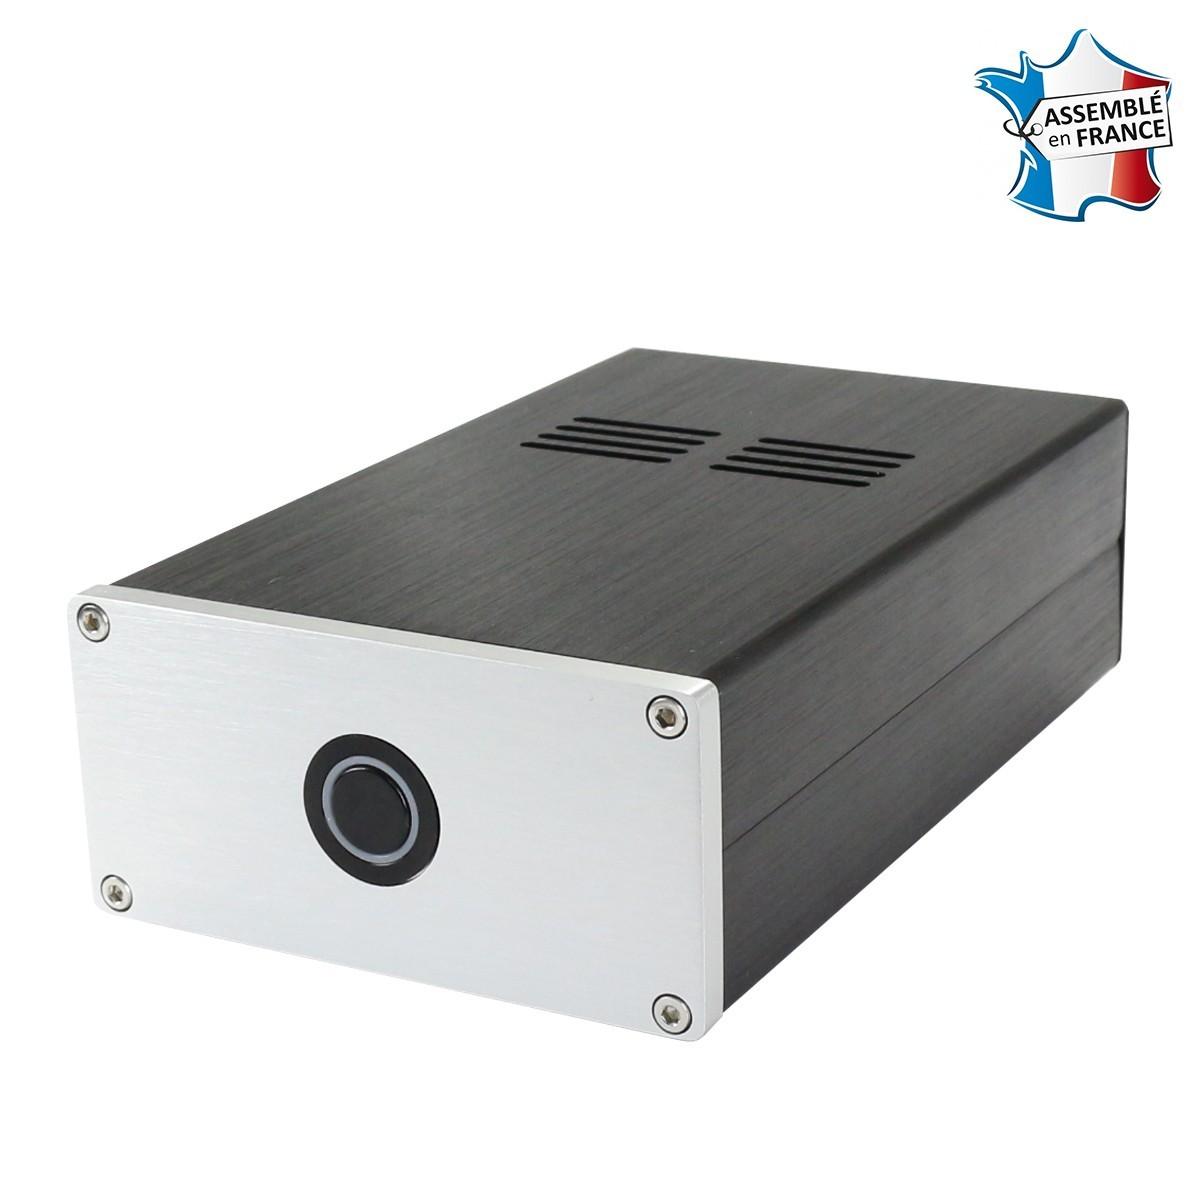 RaspDIGI LTE LVDS Reclocker KALI - Streamer I2S LVDS HDMI Audio-GD compatible